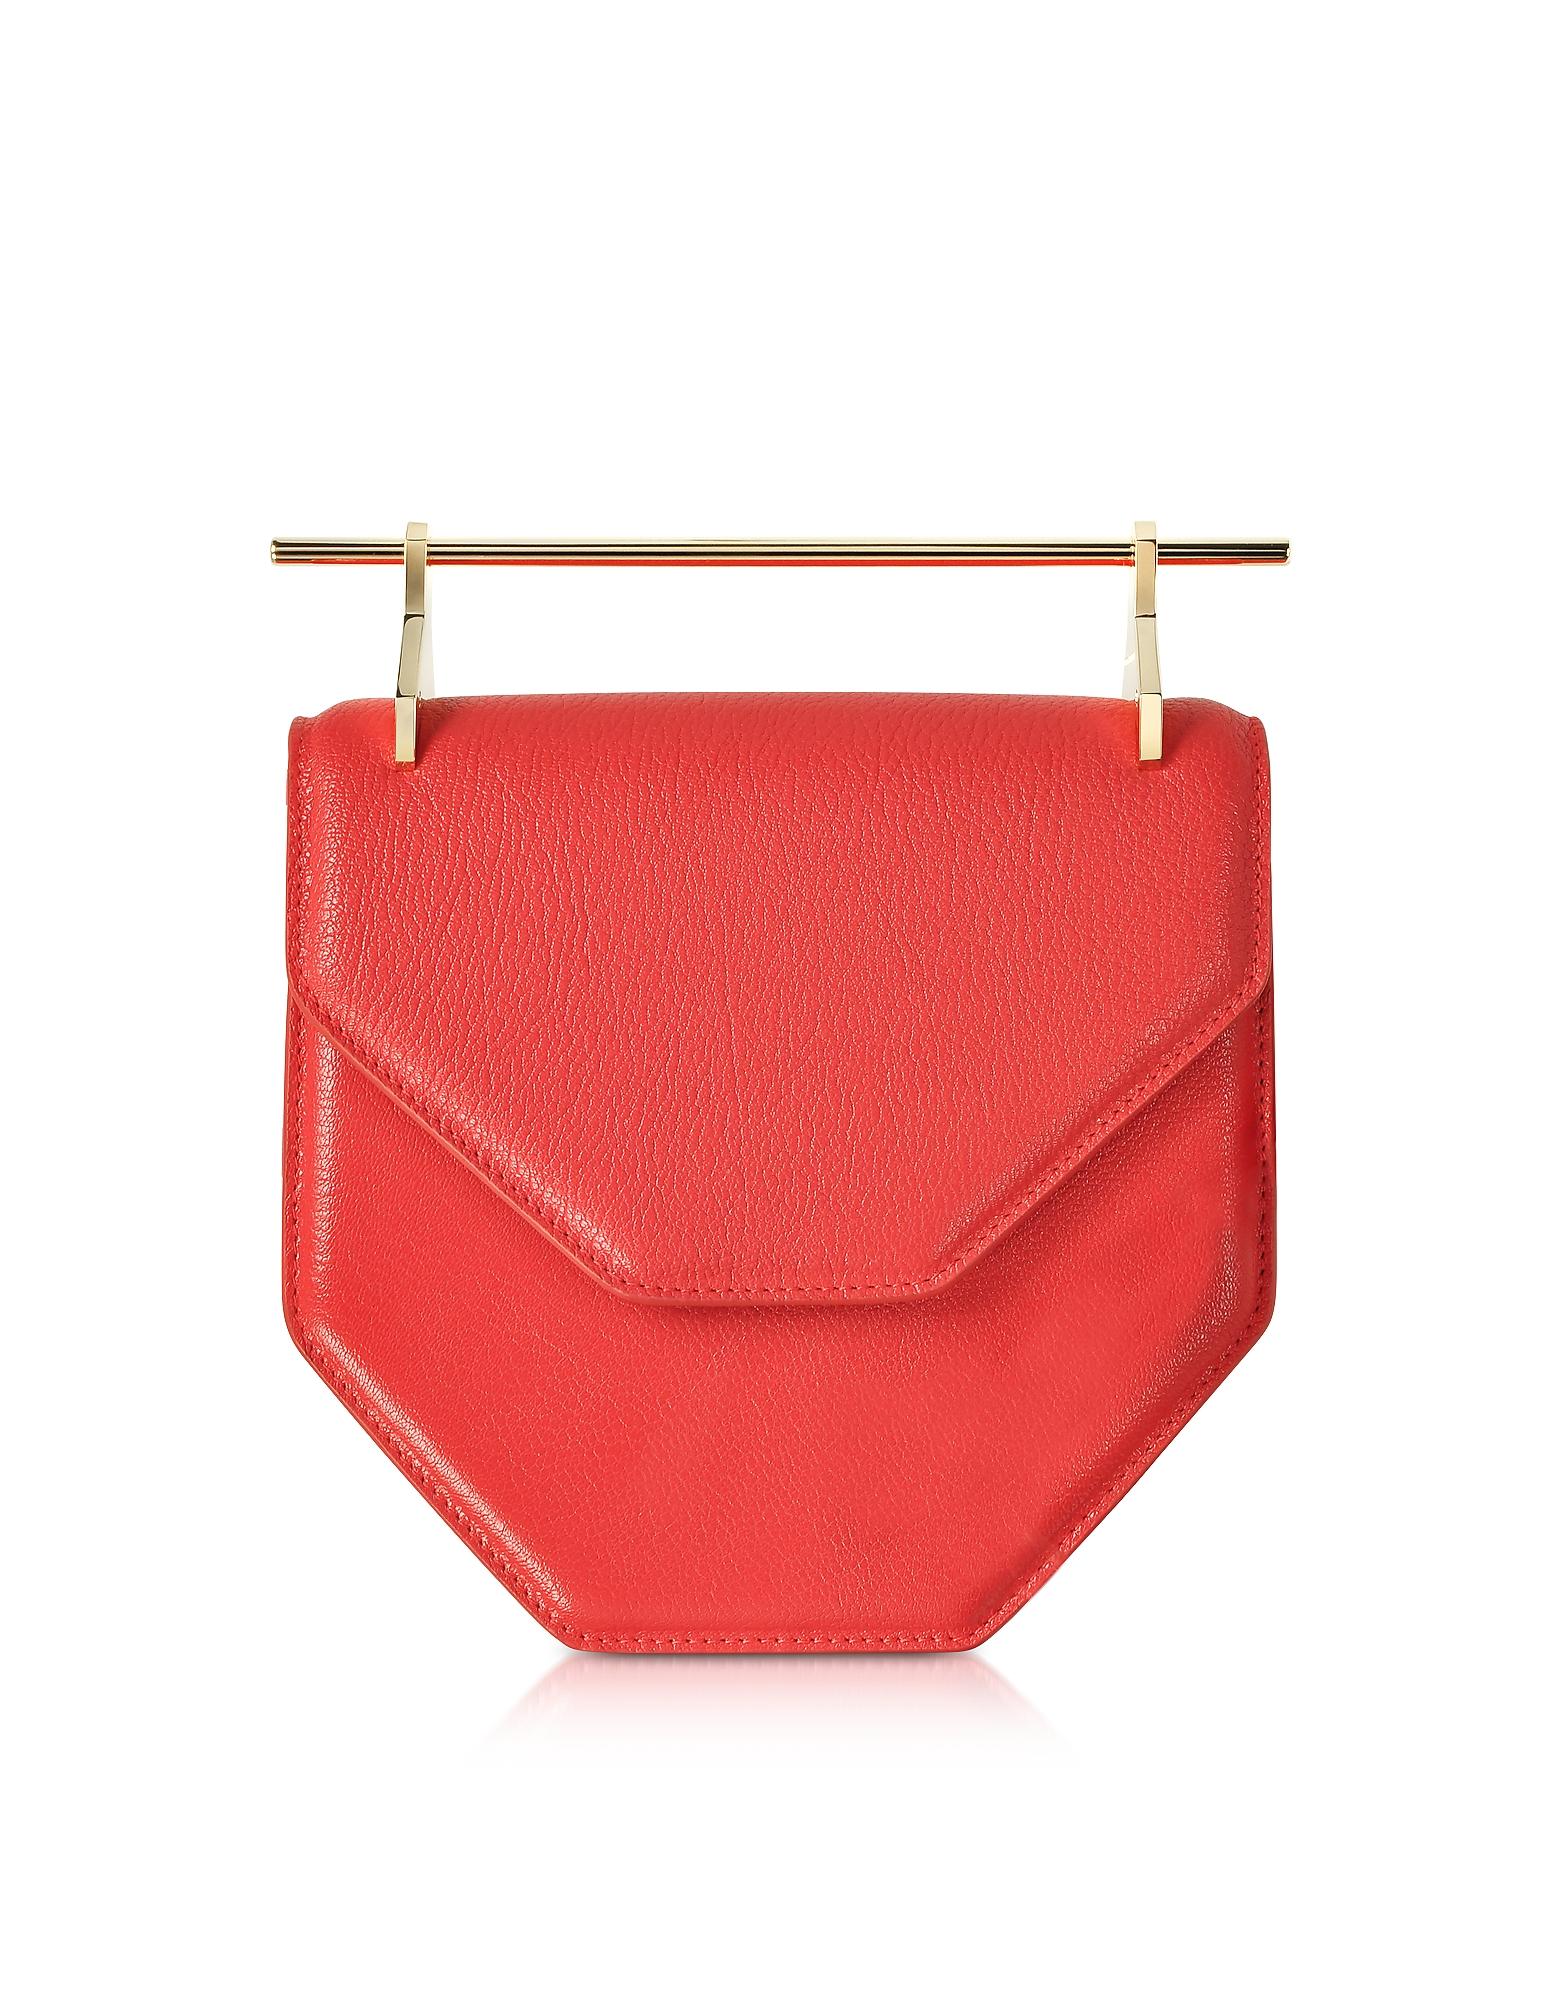 Amor Fati Hibiscus Leather Shoulder Bag